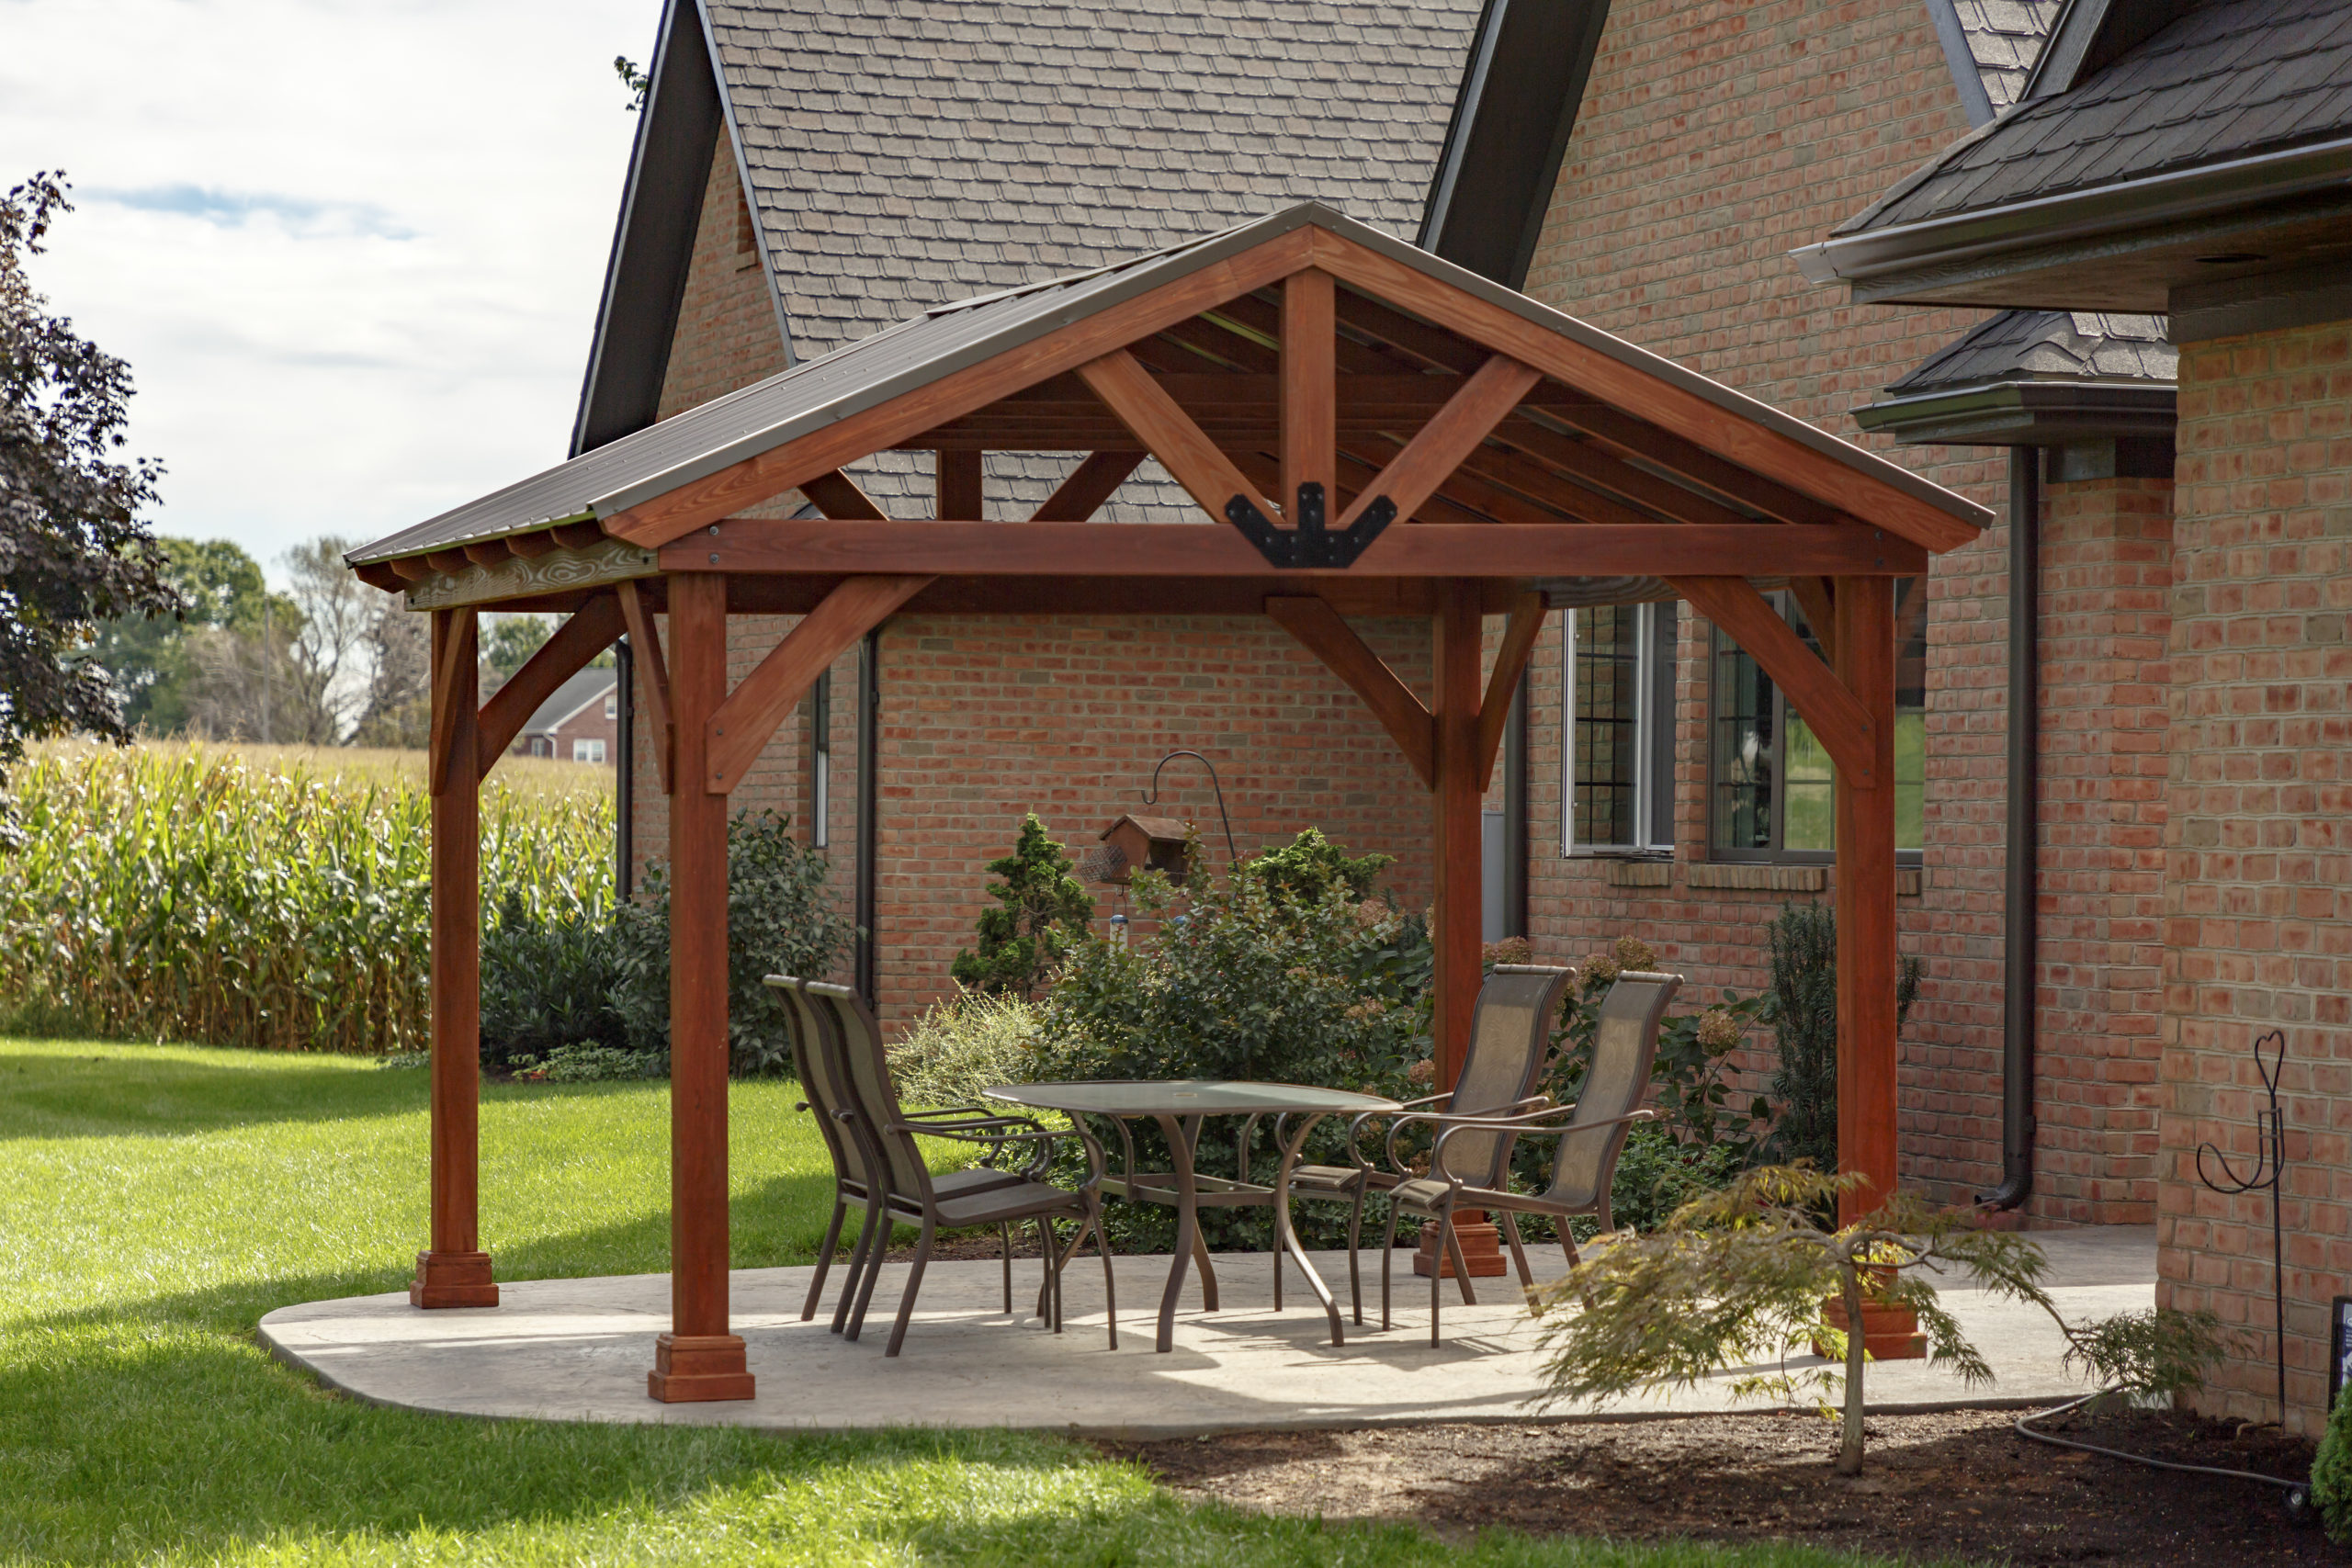 12x12 backyard wood pavilion kit canyon brown yardcraft